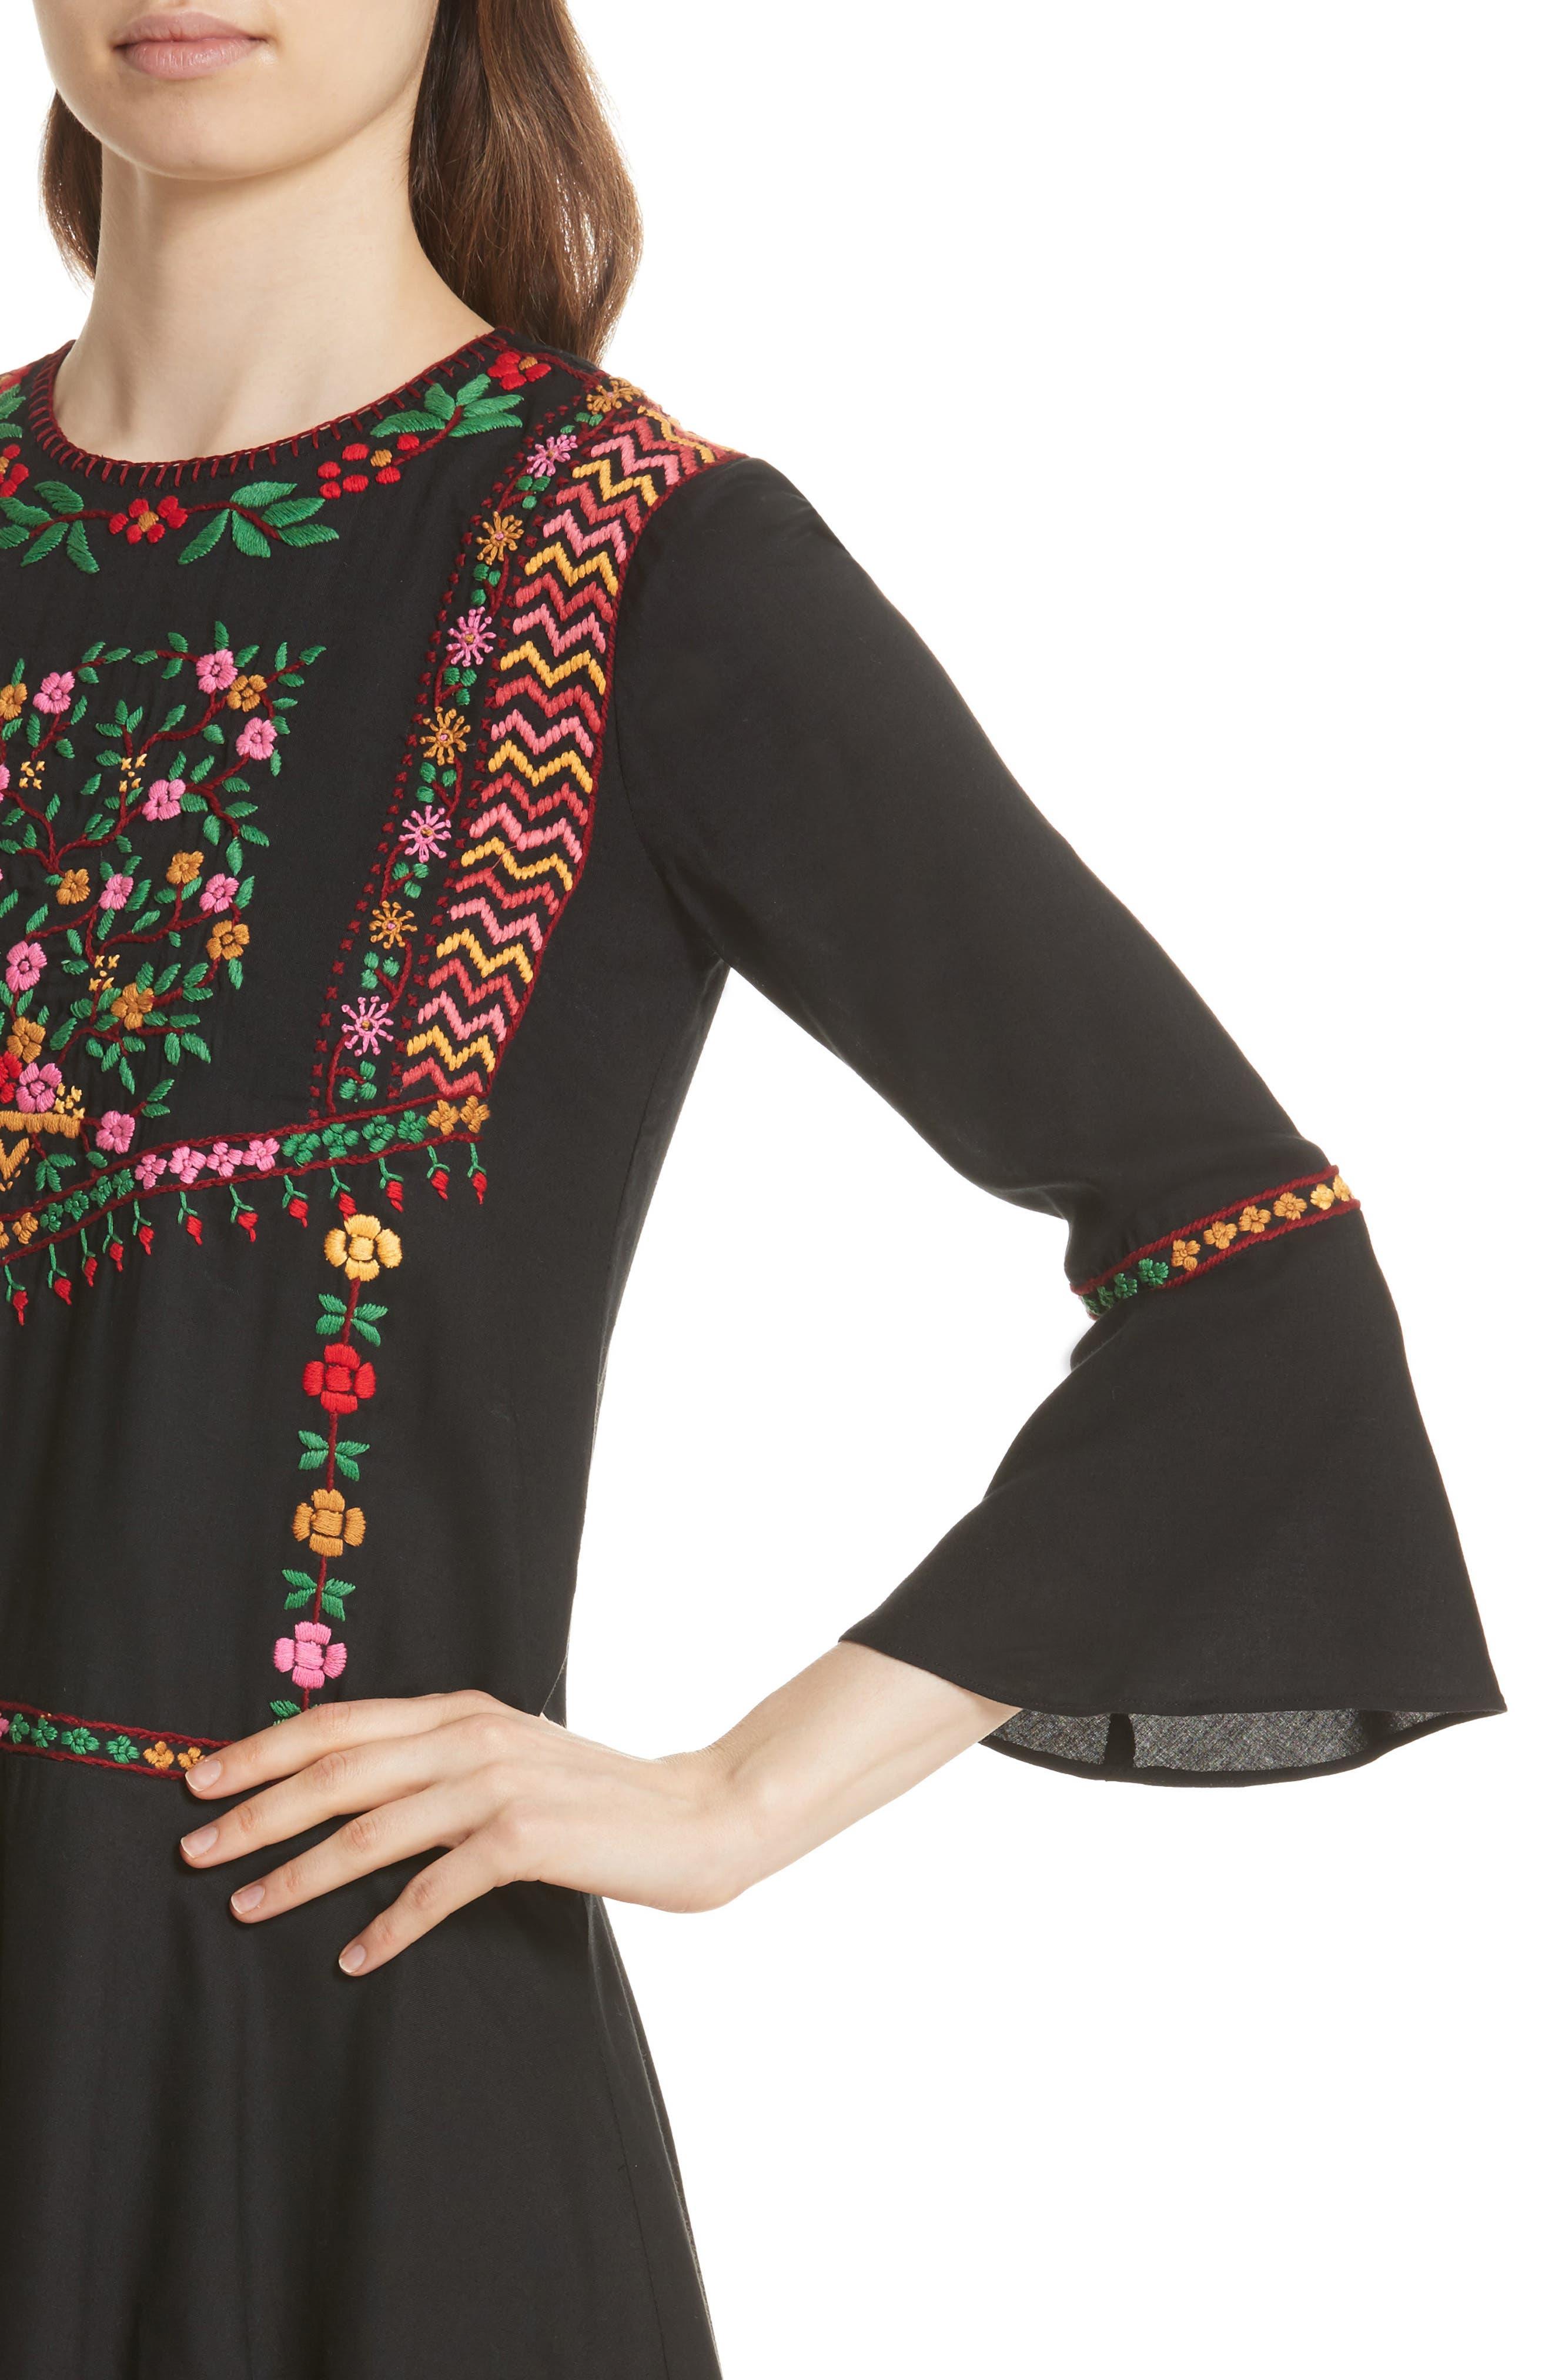 Gosinda Embroidered Dress,                             Alternate thumbnail 4, color,                             Caviar/ Multi